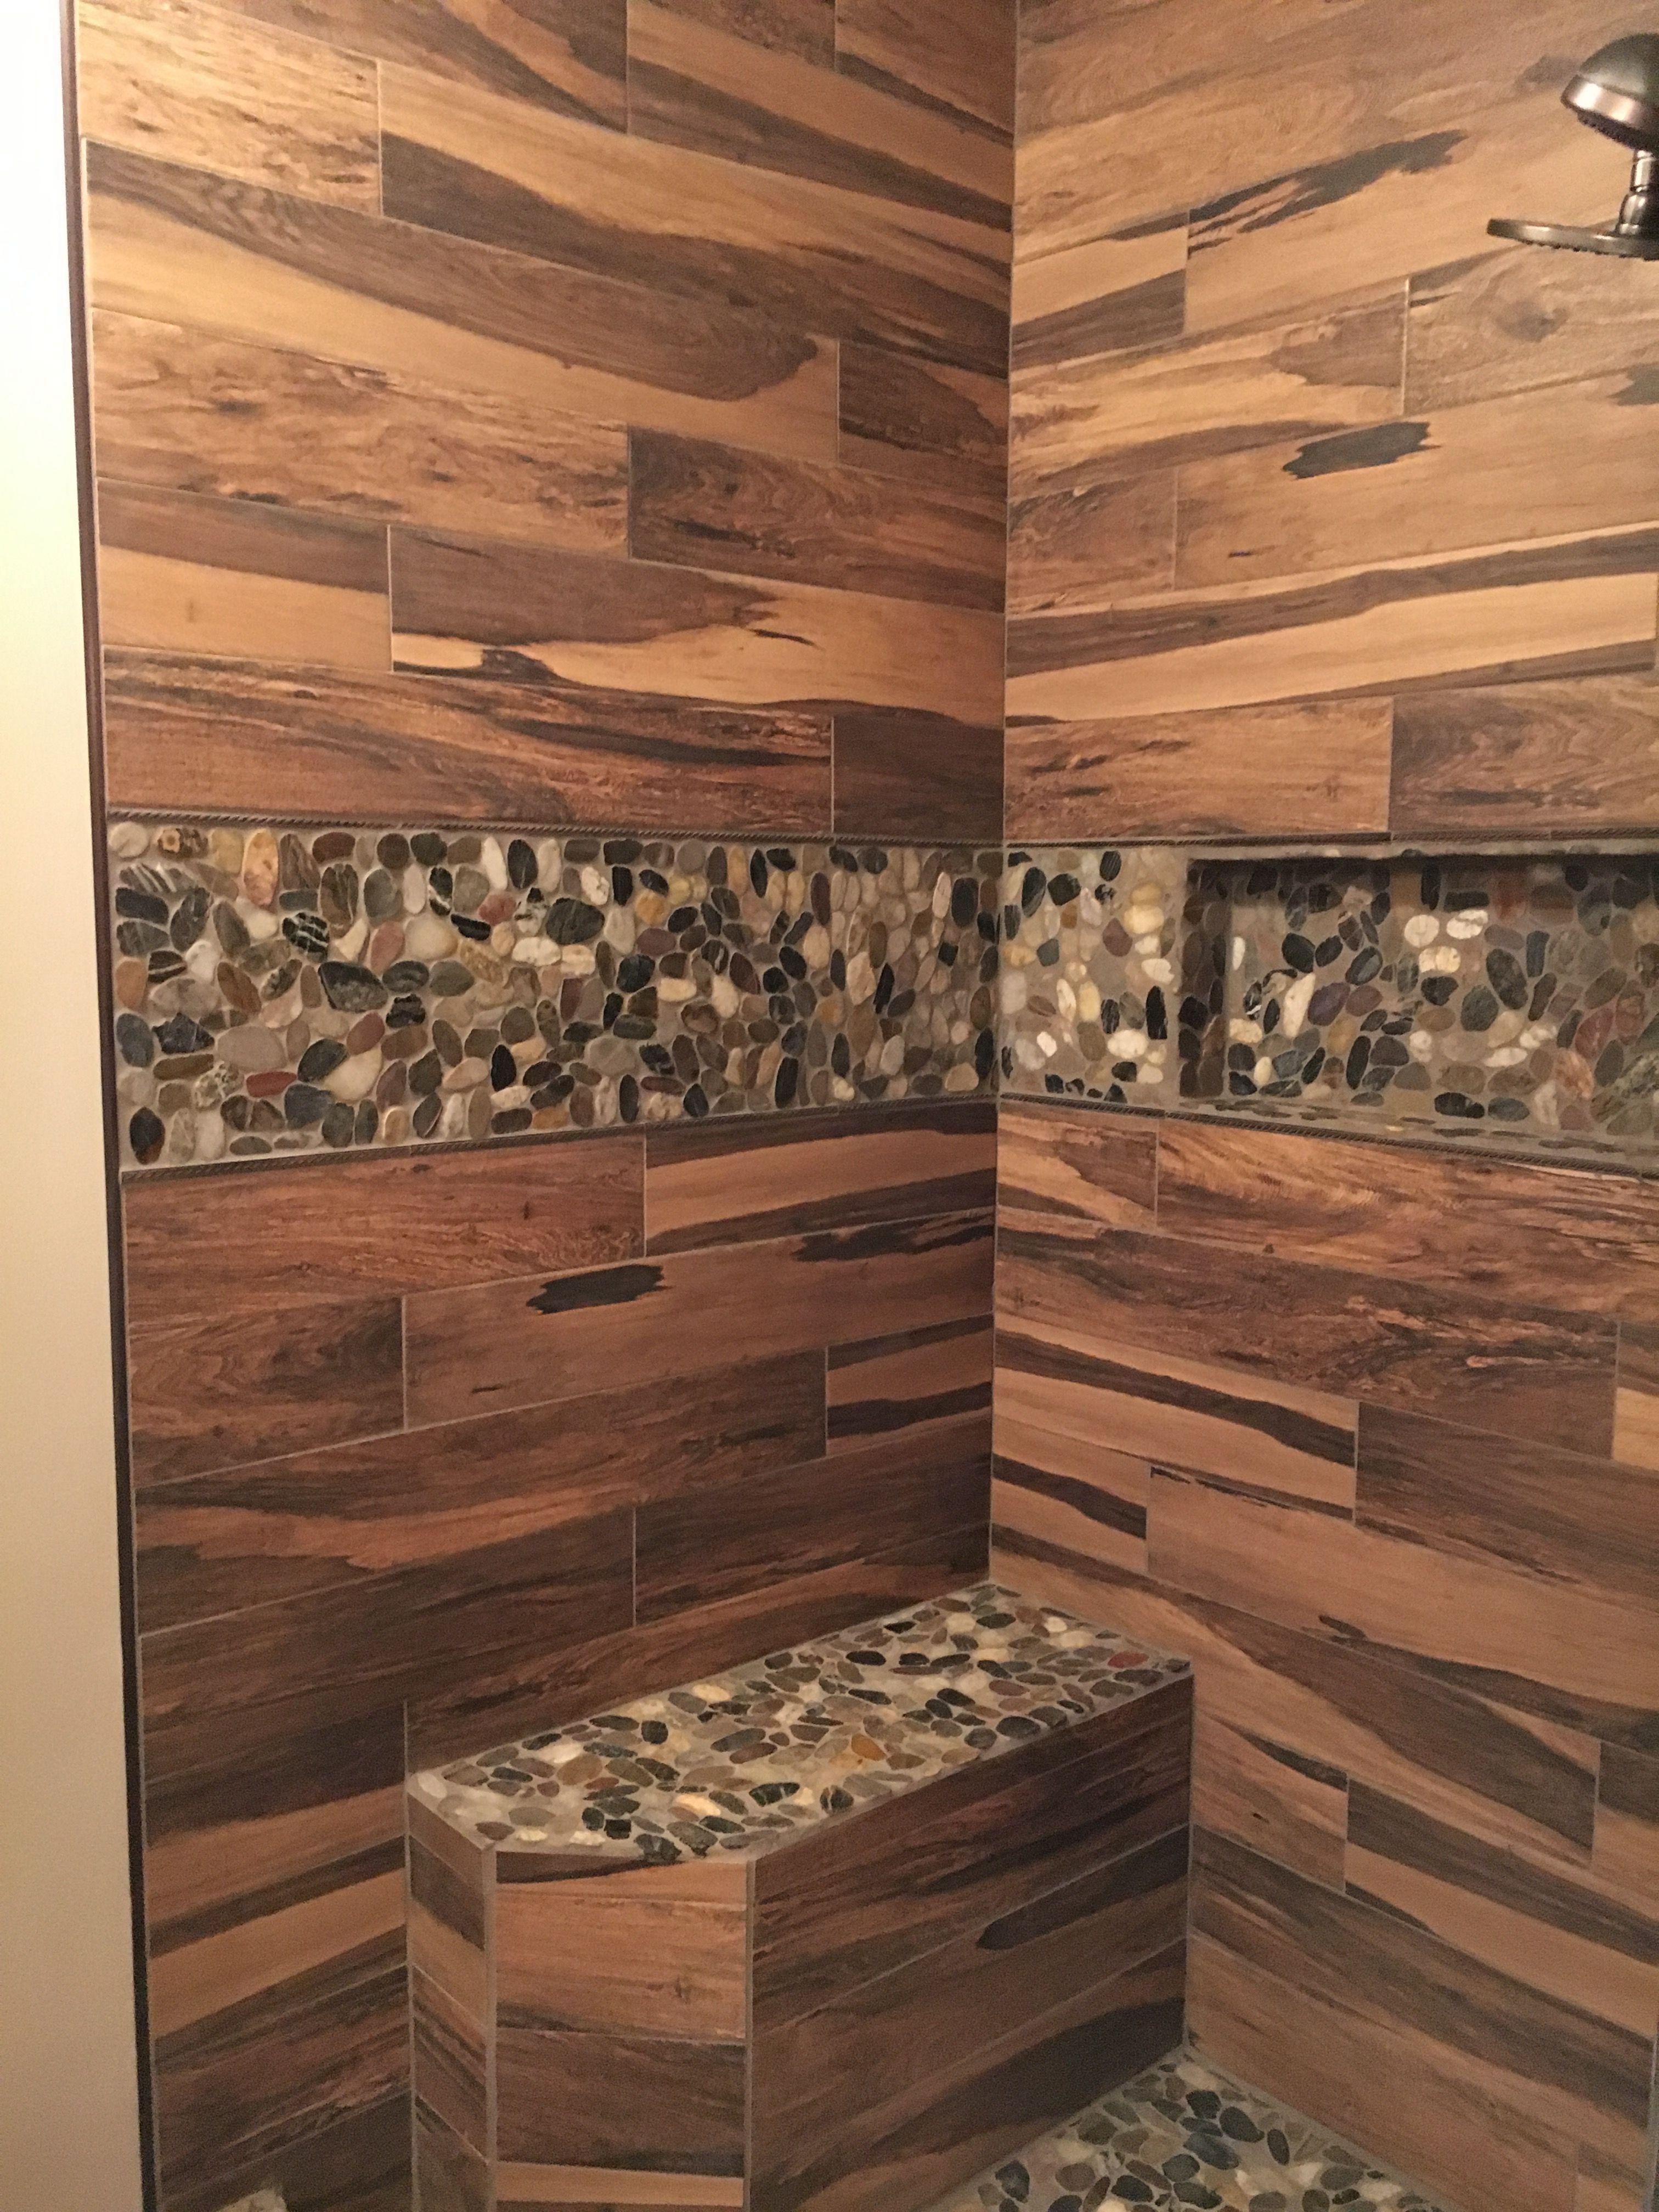 30 Amazing Natural Stone Floors For Bathroom Design Ideas